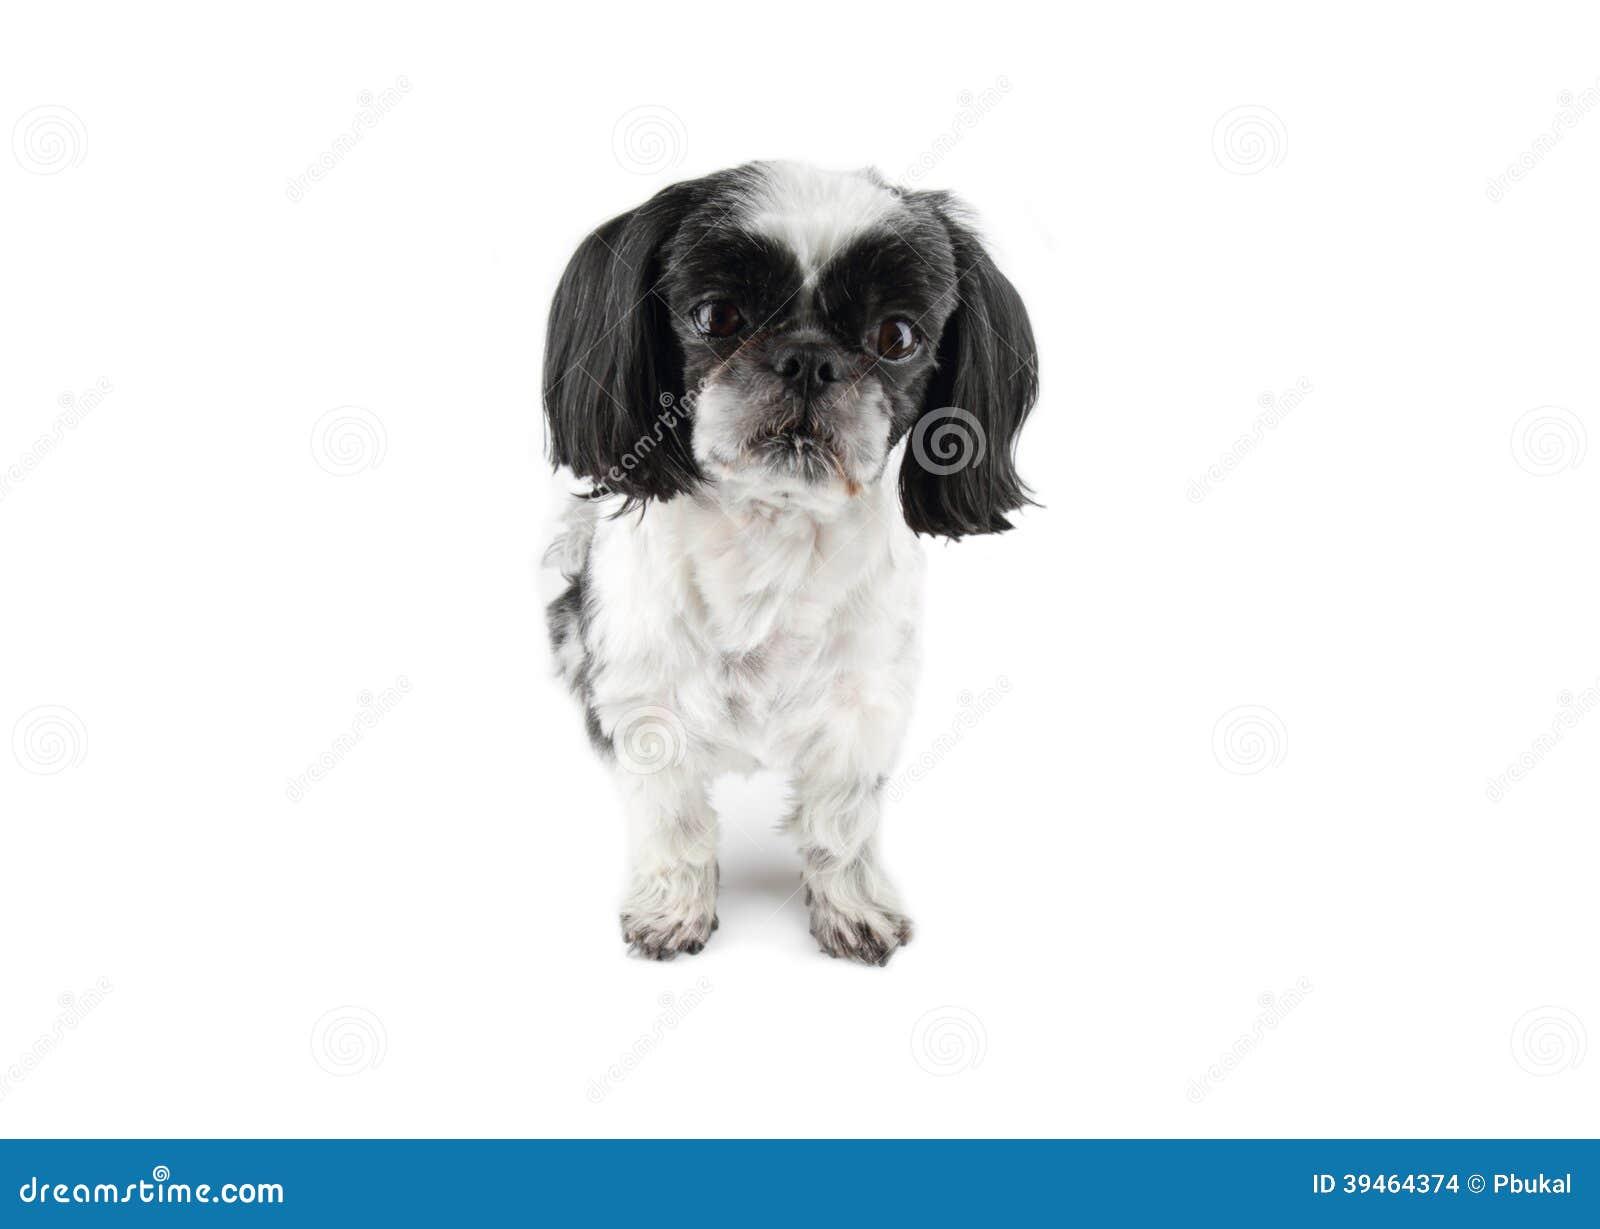 Shih-tzu dog